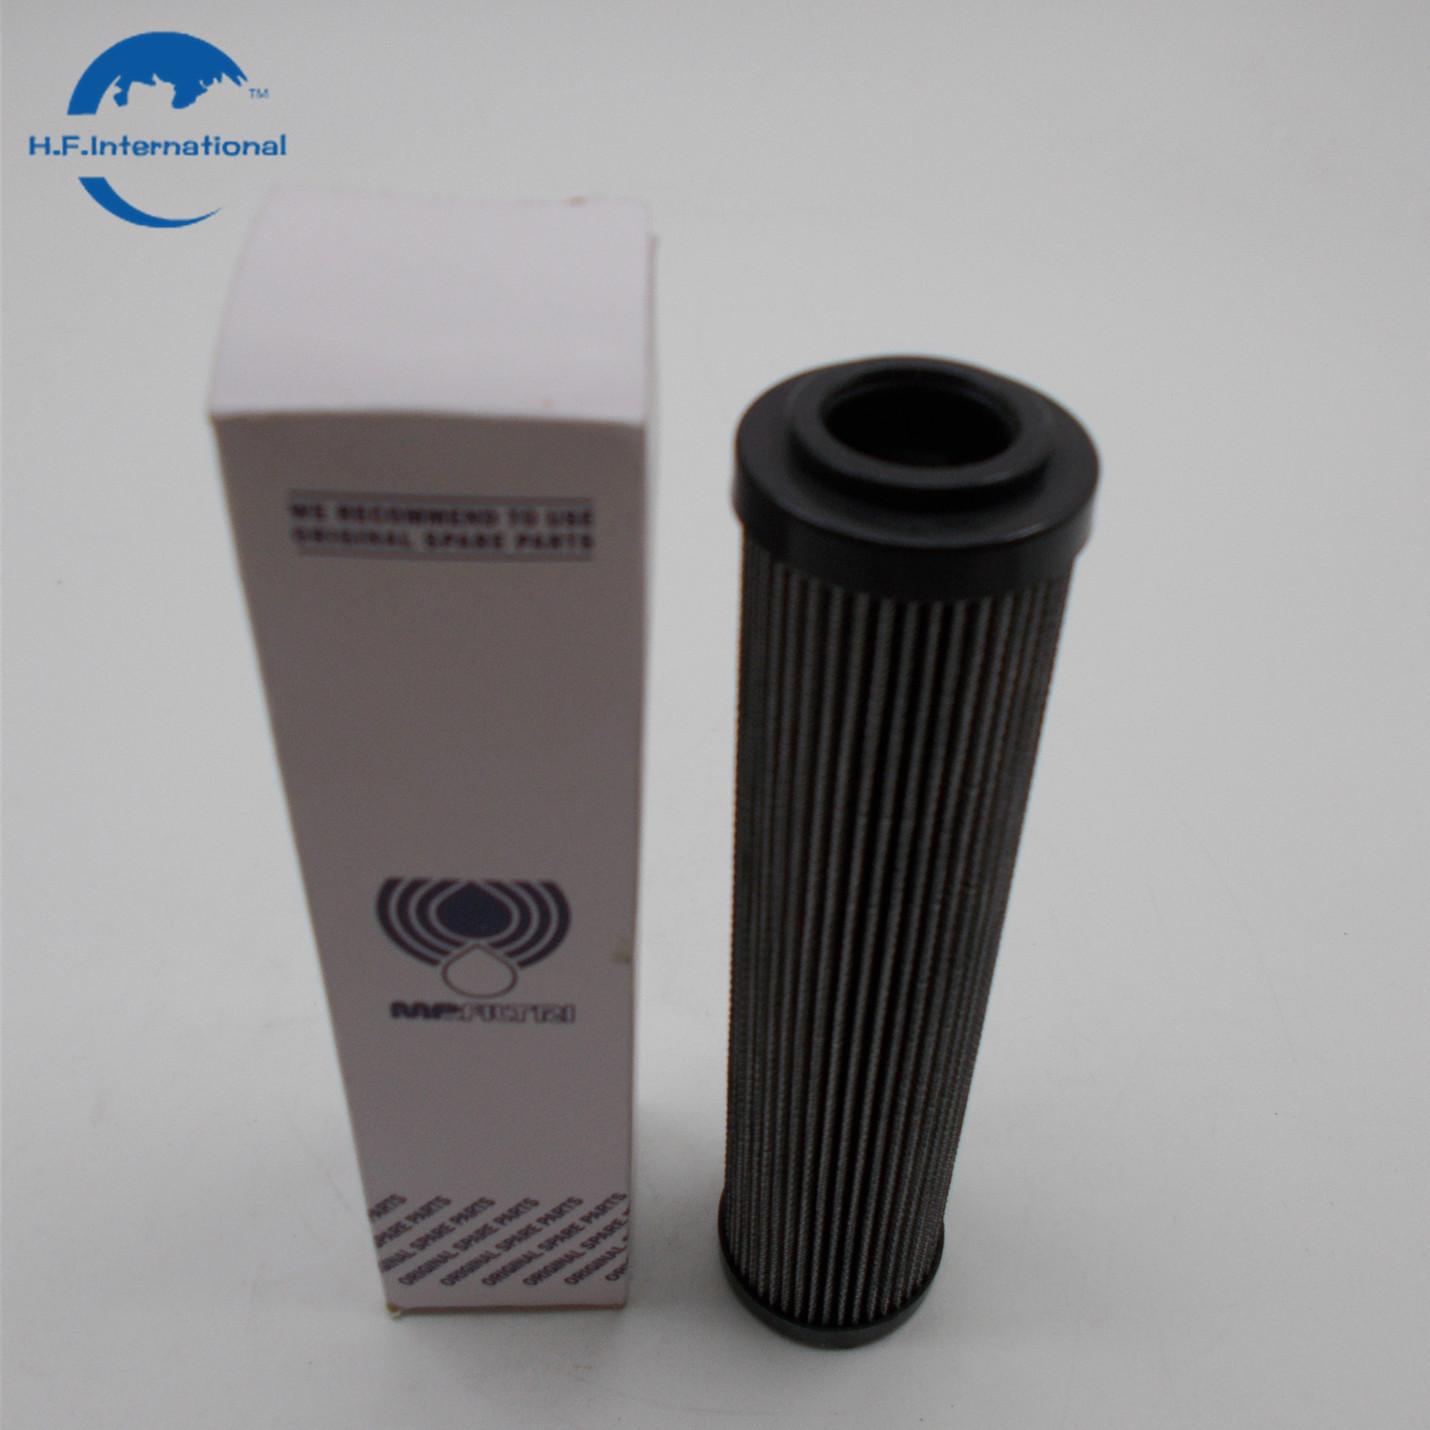 MP-FILTRI-MF7501A10HBP01 Replacement Cartridge